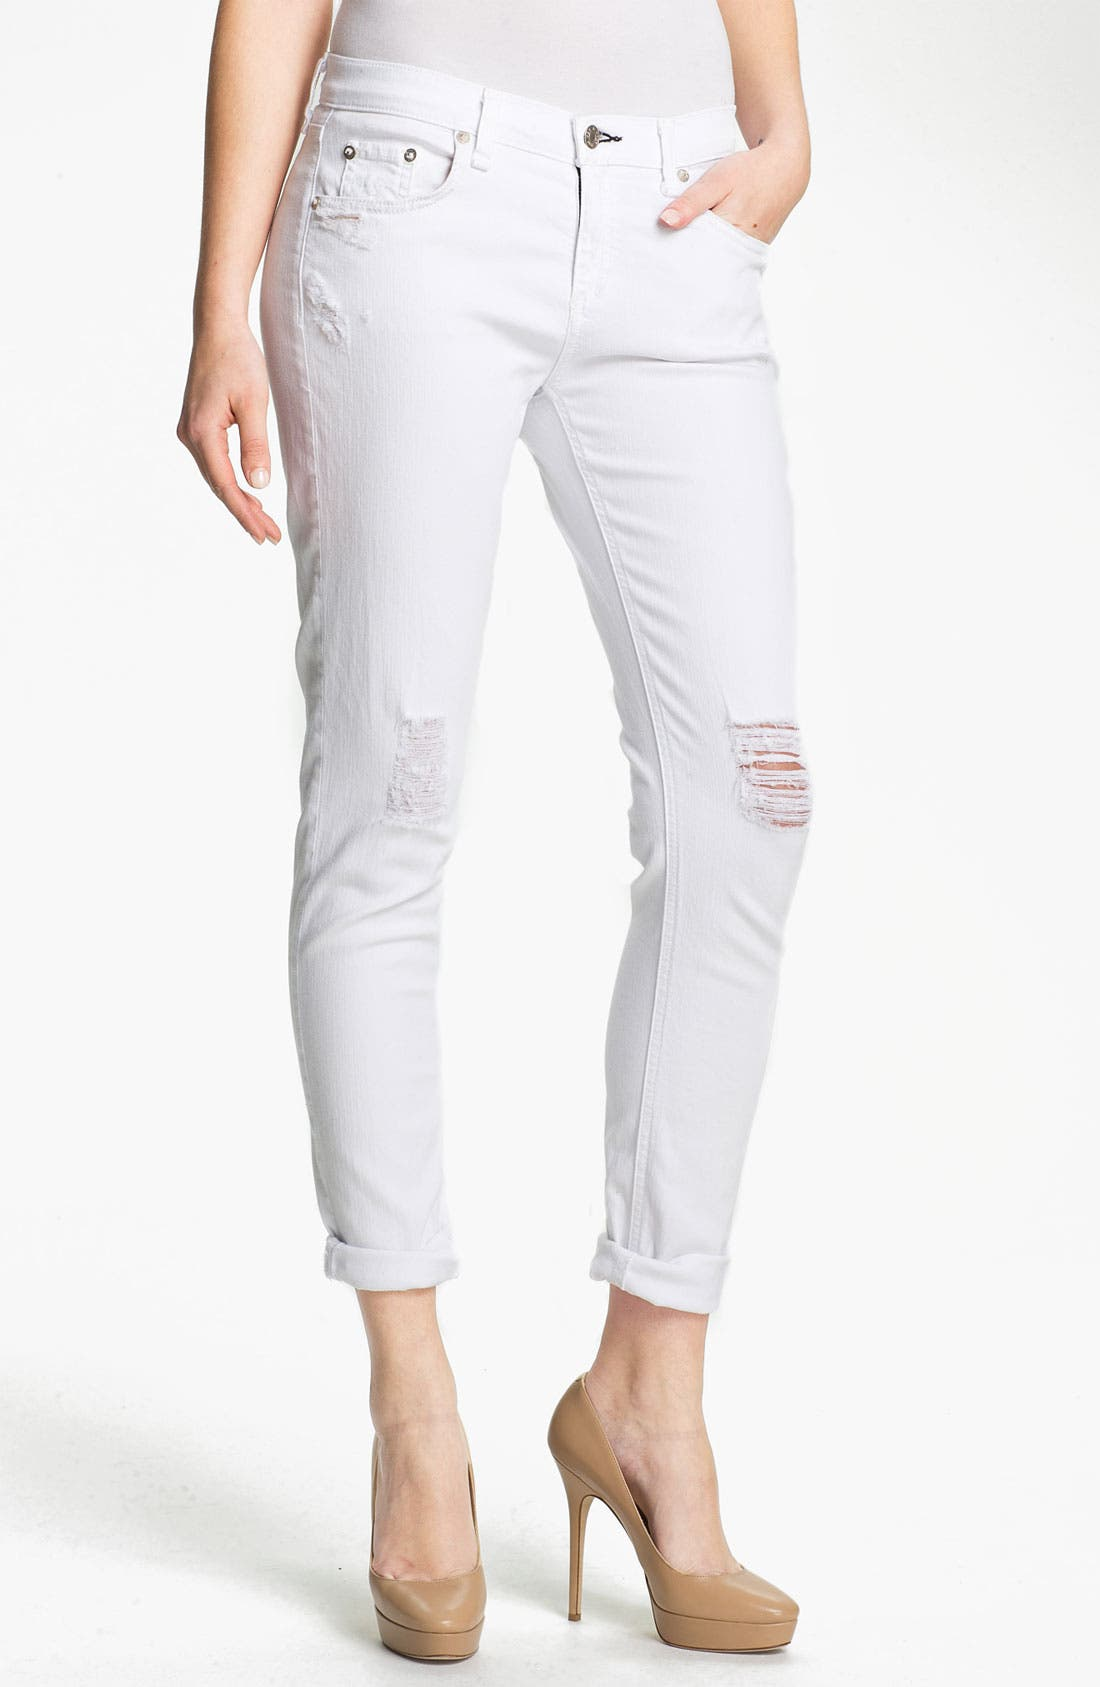 Main Image - rag & bone/JEAN 'The Dash' Slouchy Skinny Jeans